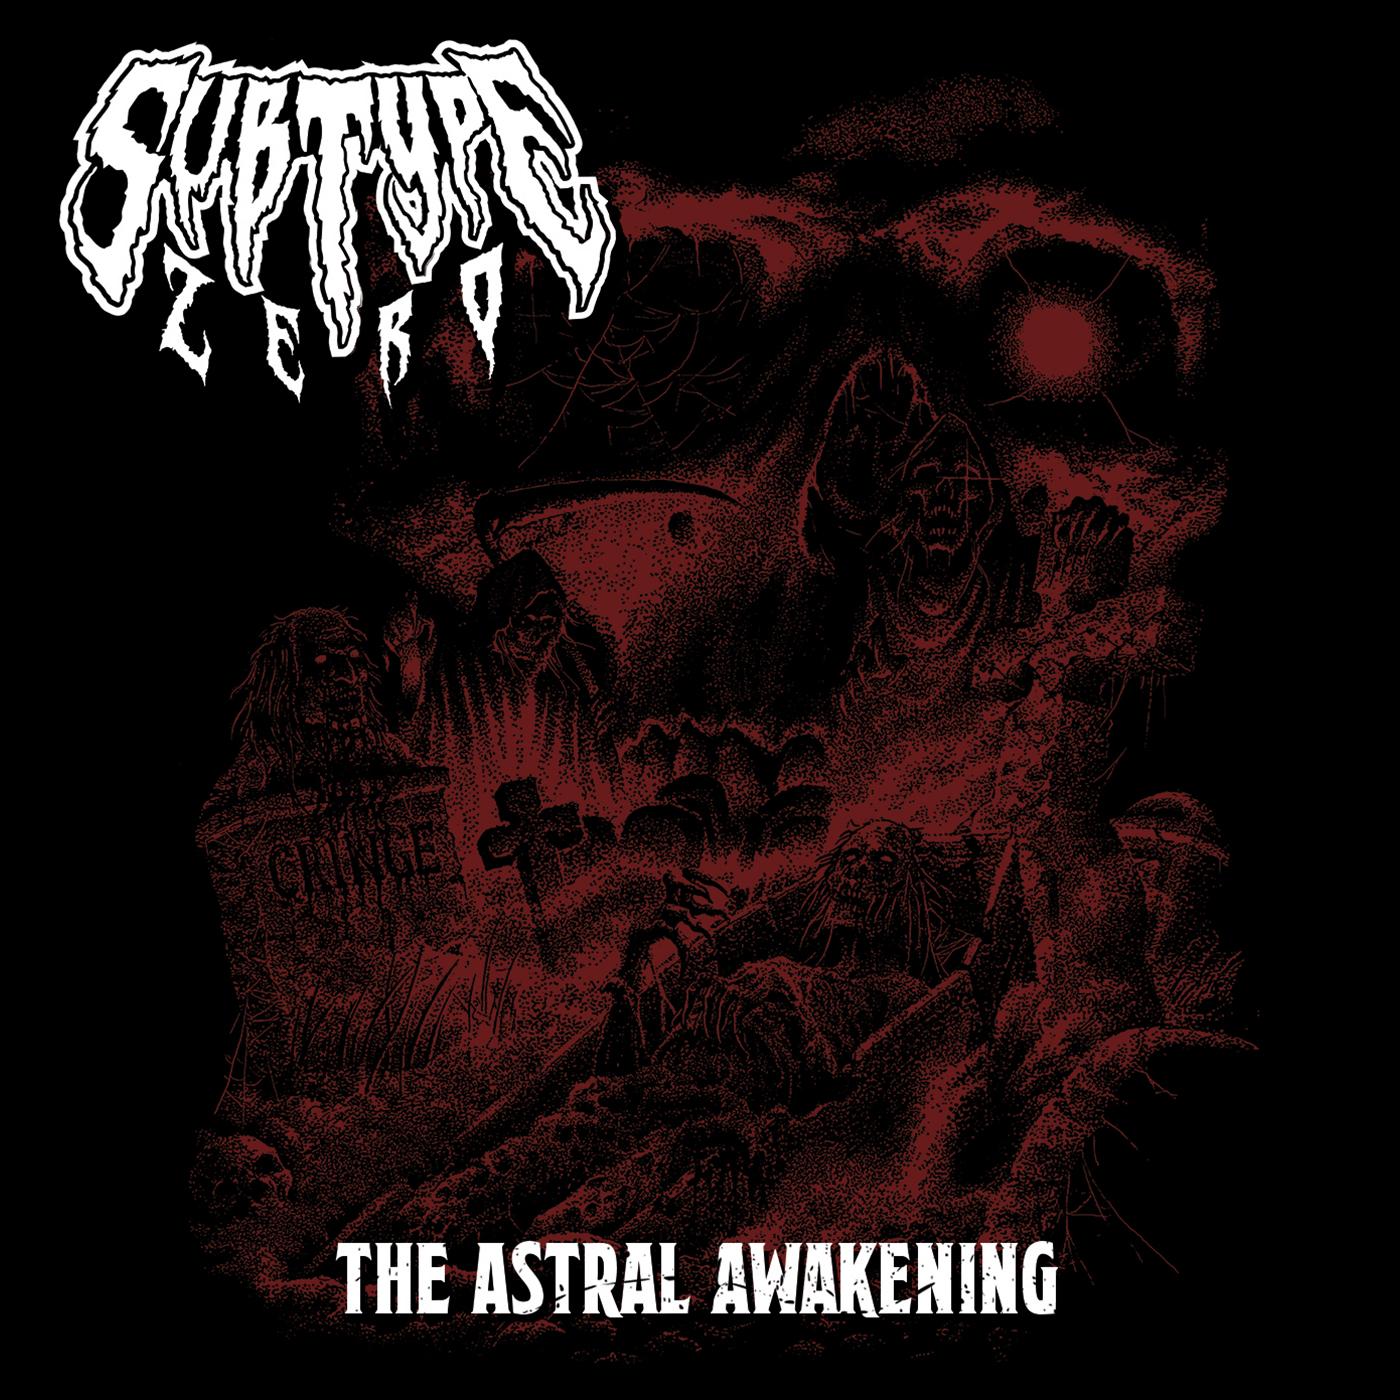 SUBTYPE ZERO - The Astral Awakening